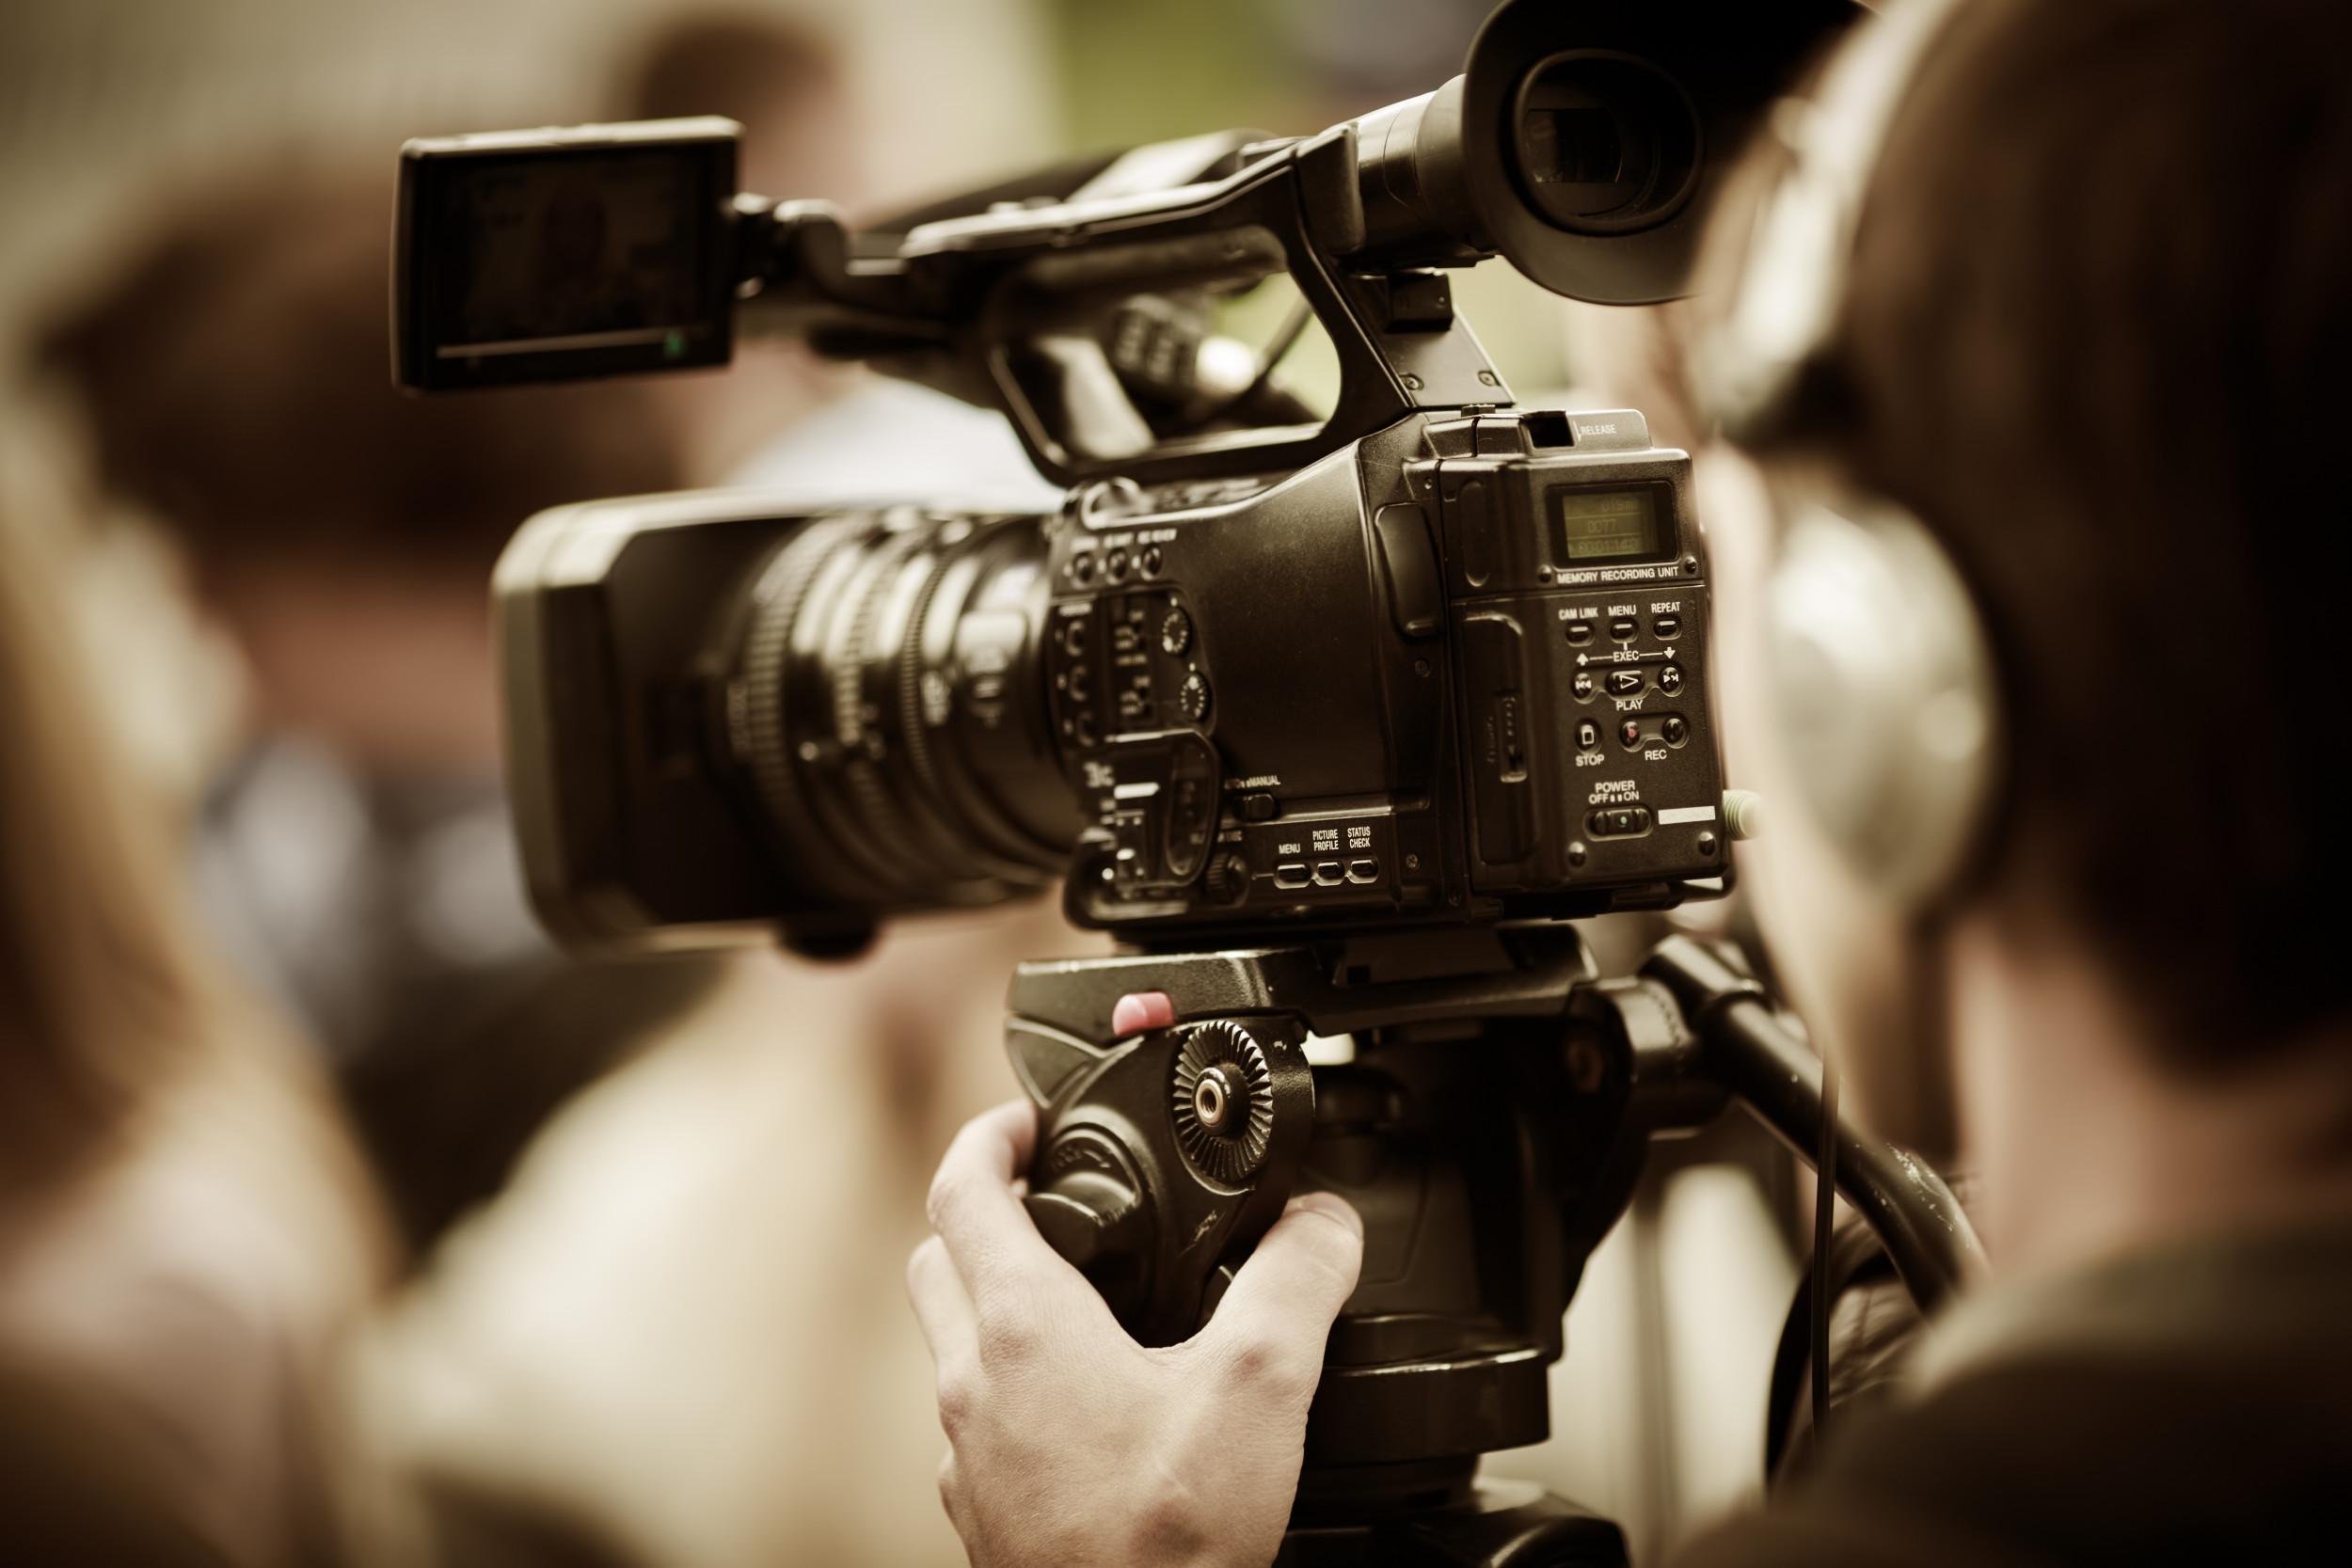 Unprovoked Assault on Nashville News Team by Unidentified Man Captured on Video